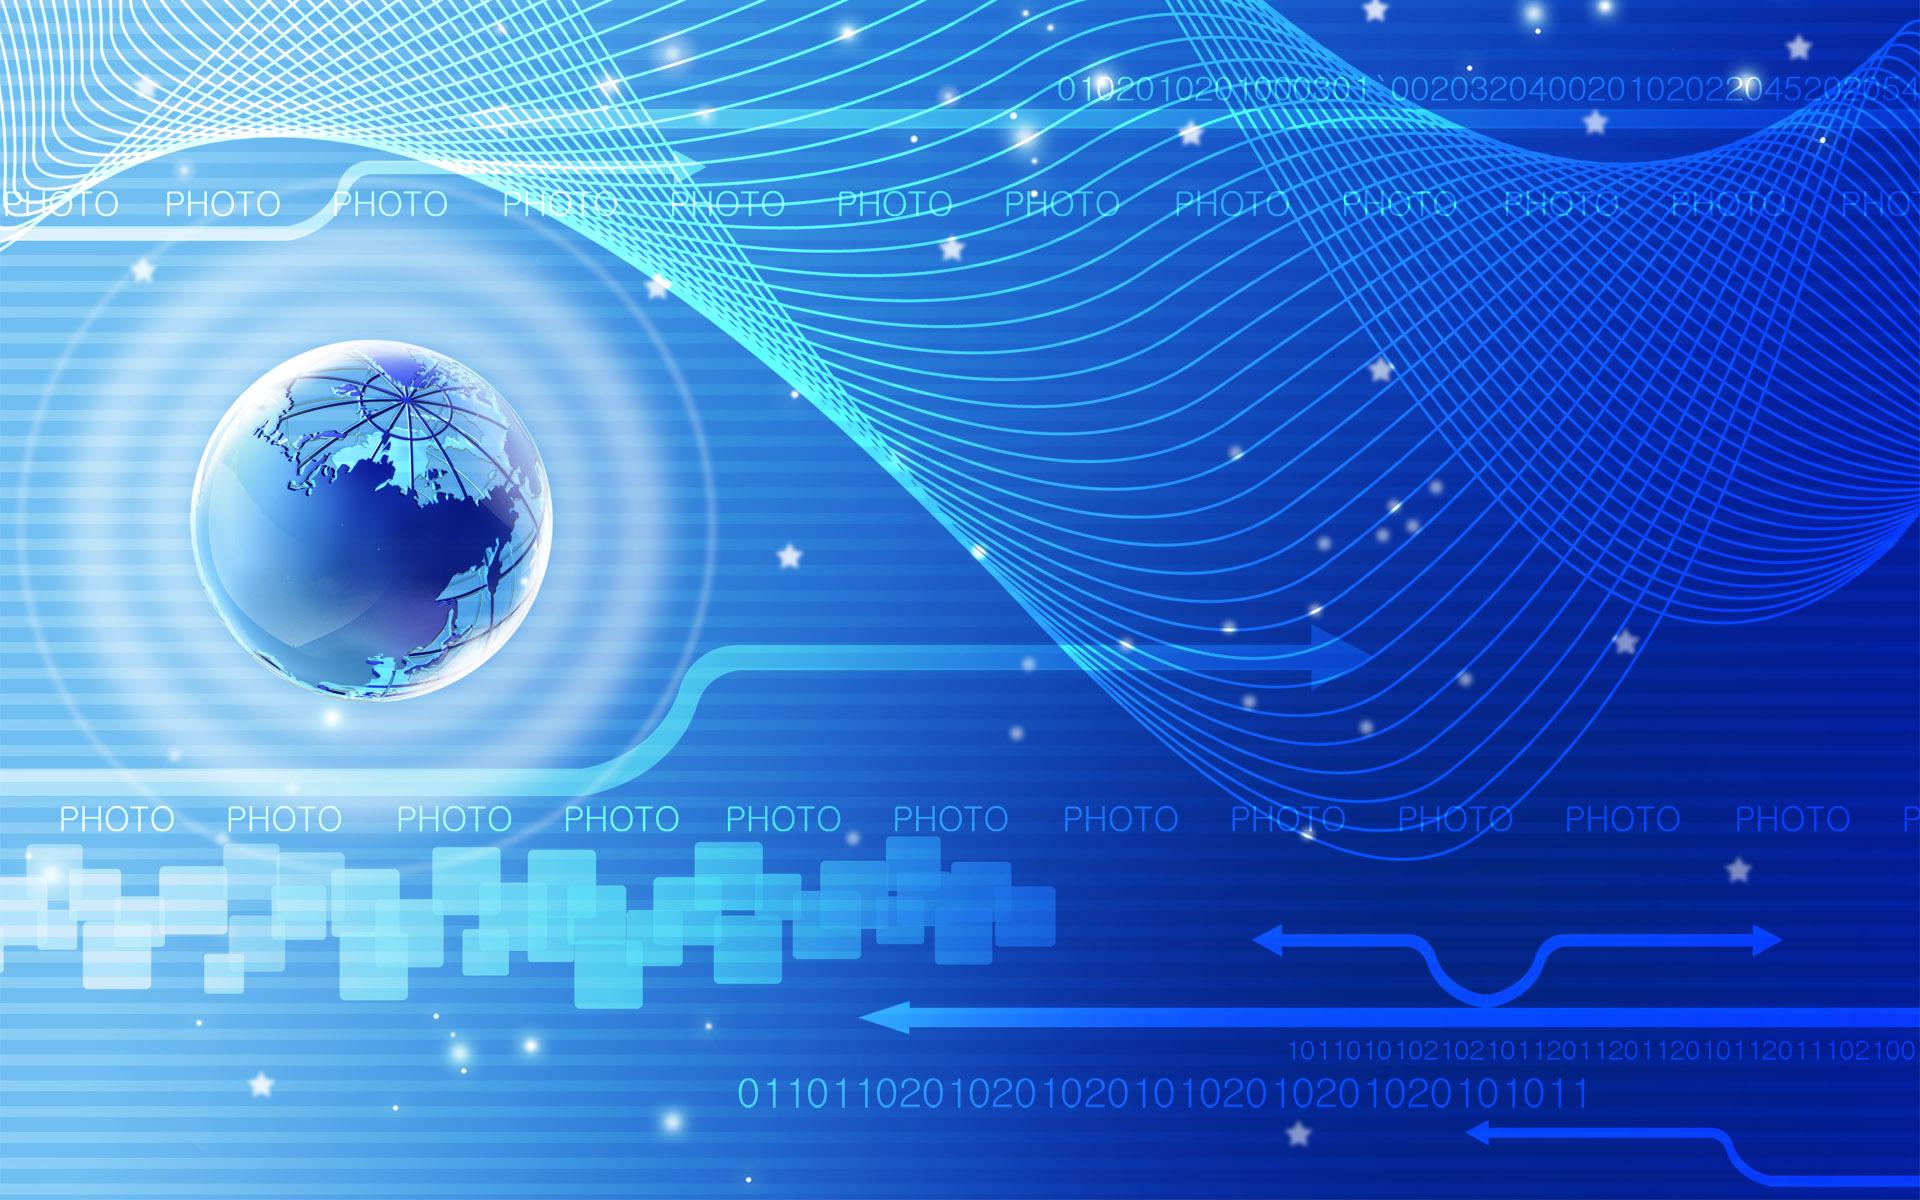 HD Desktop Technology Wallpaper Backgrounds For Download 1920x1200